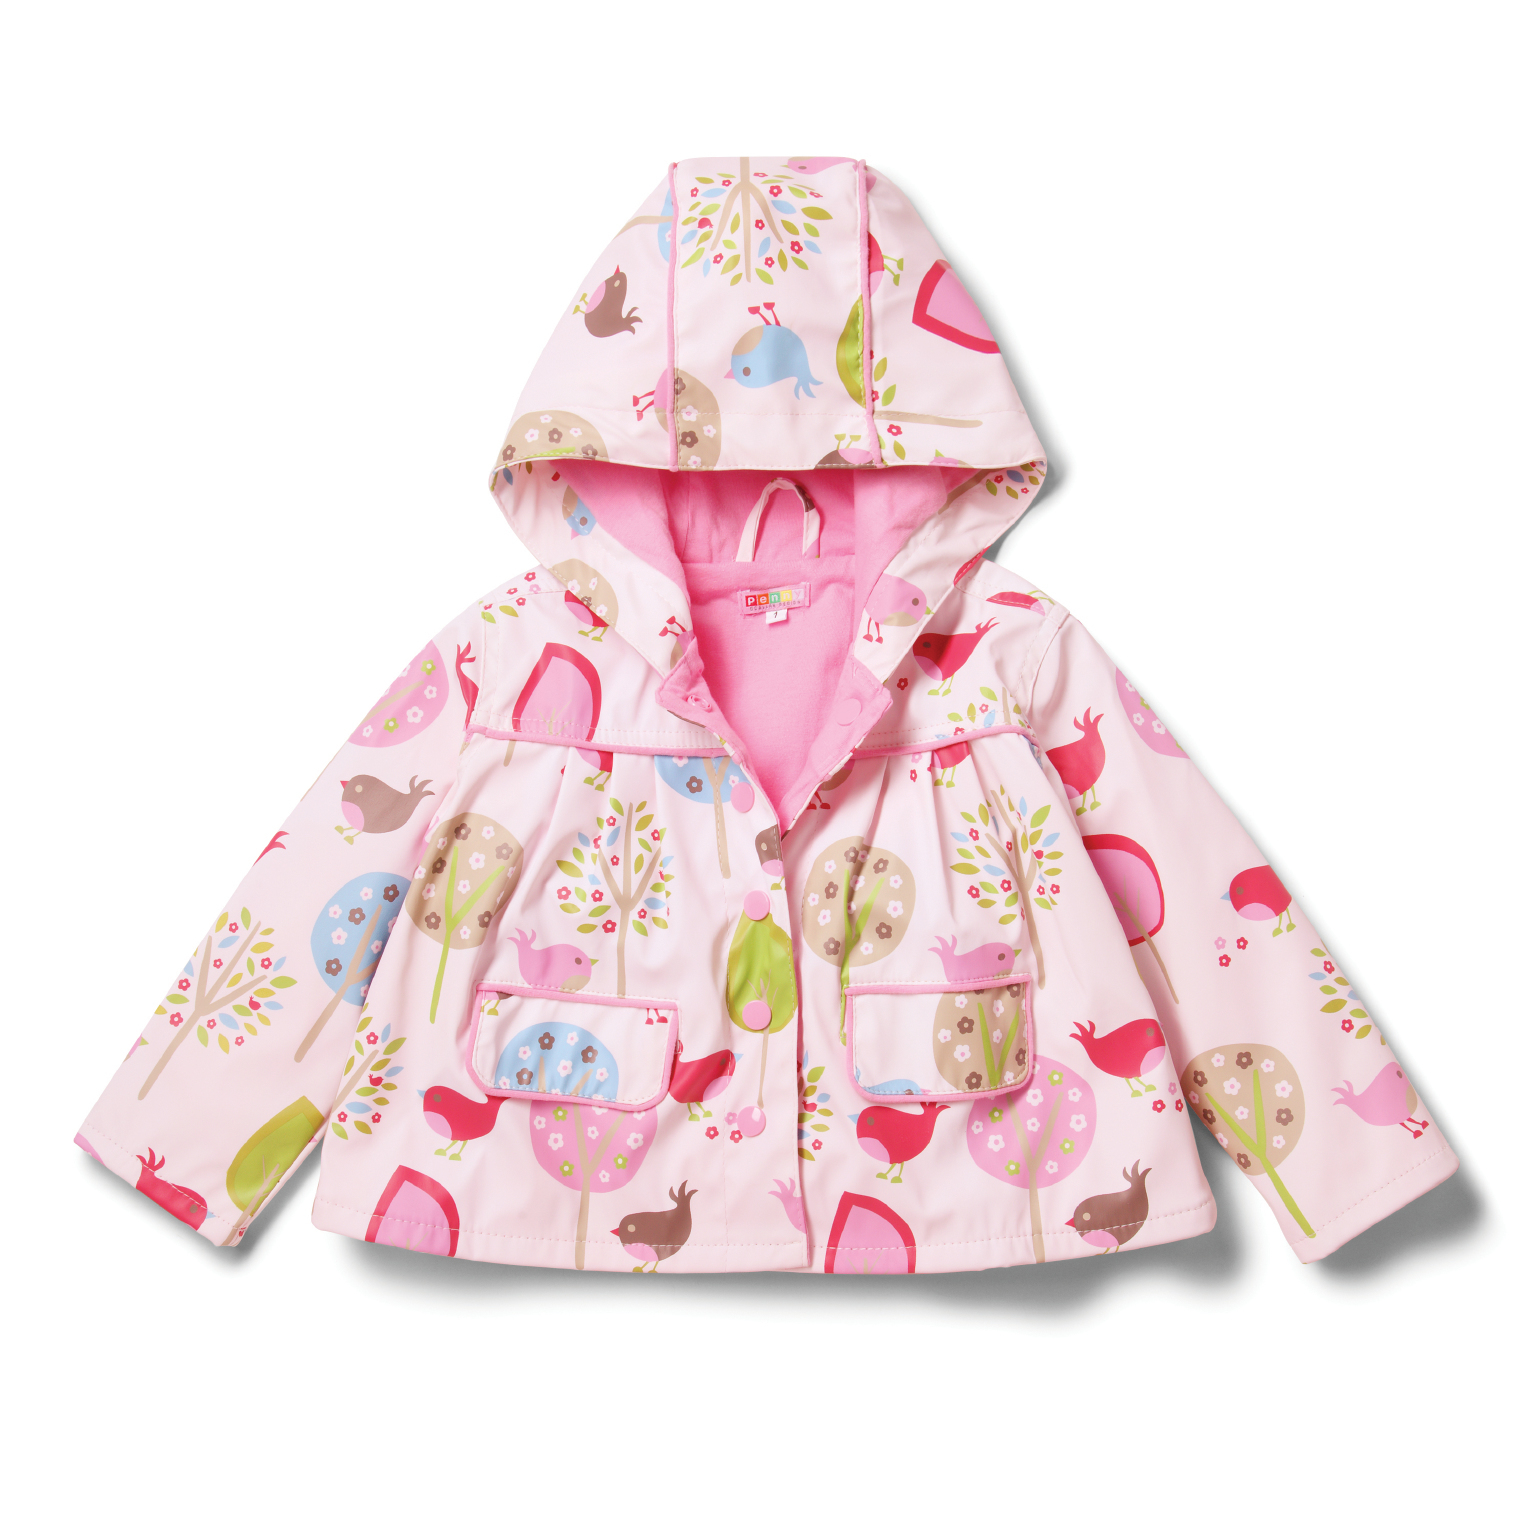 Raincoat Chirpy Bird - Size - 7-8 image